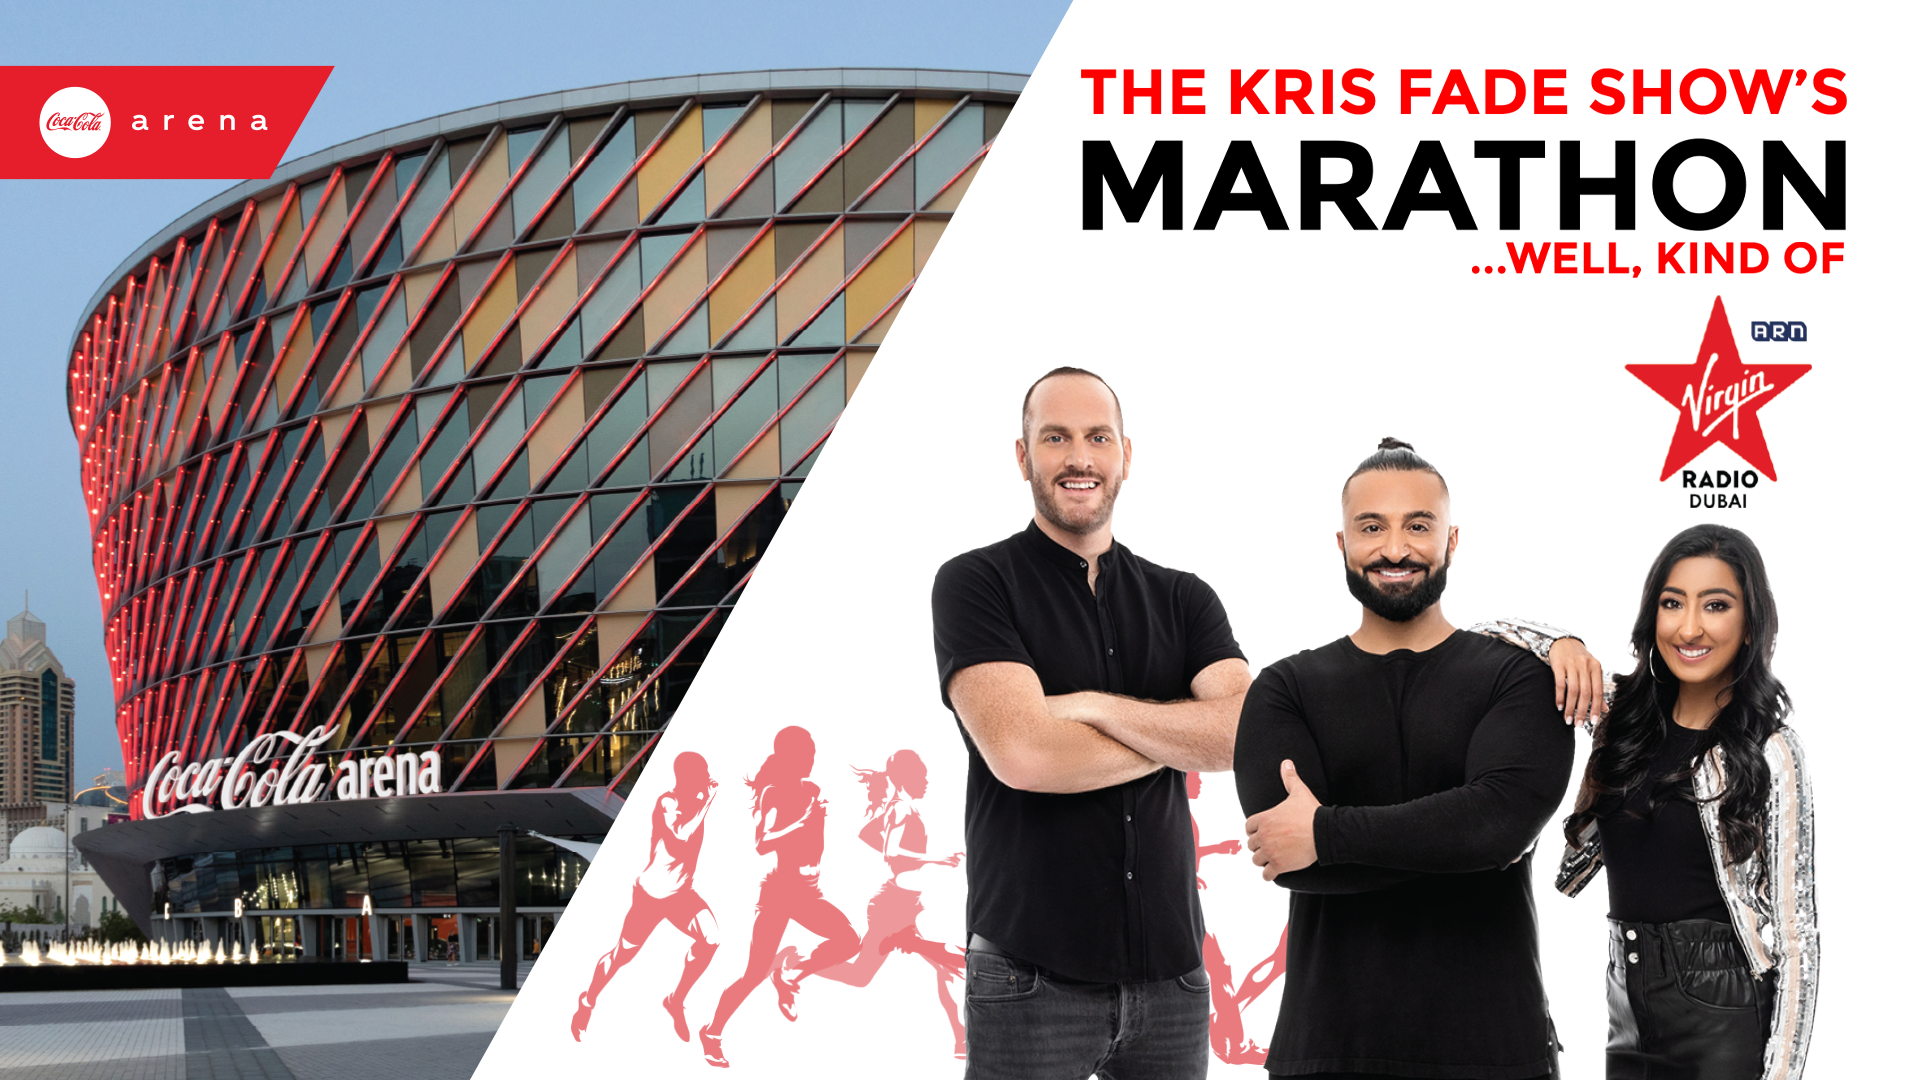 The Kris Fade Show's Marathon